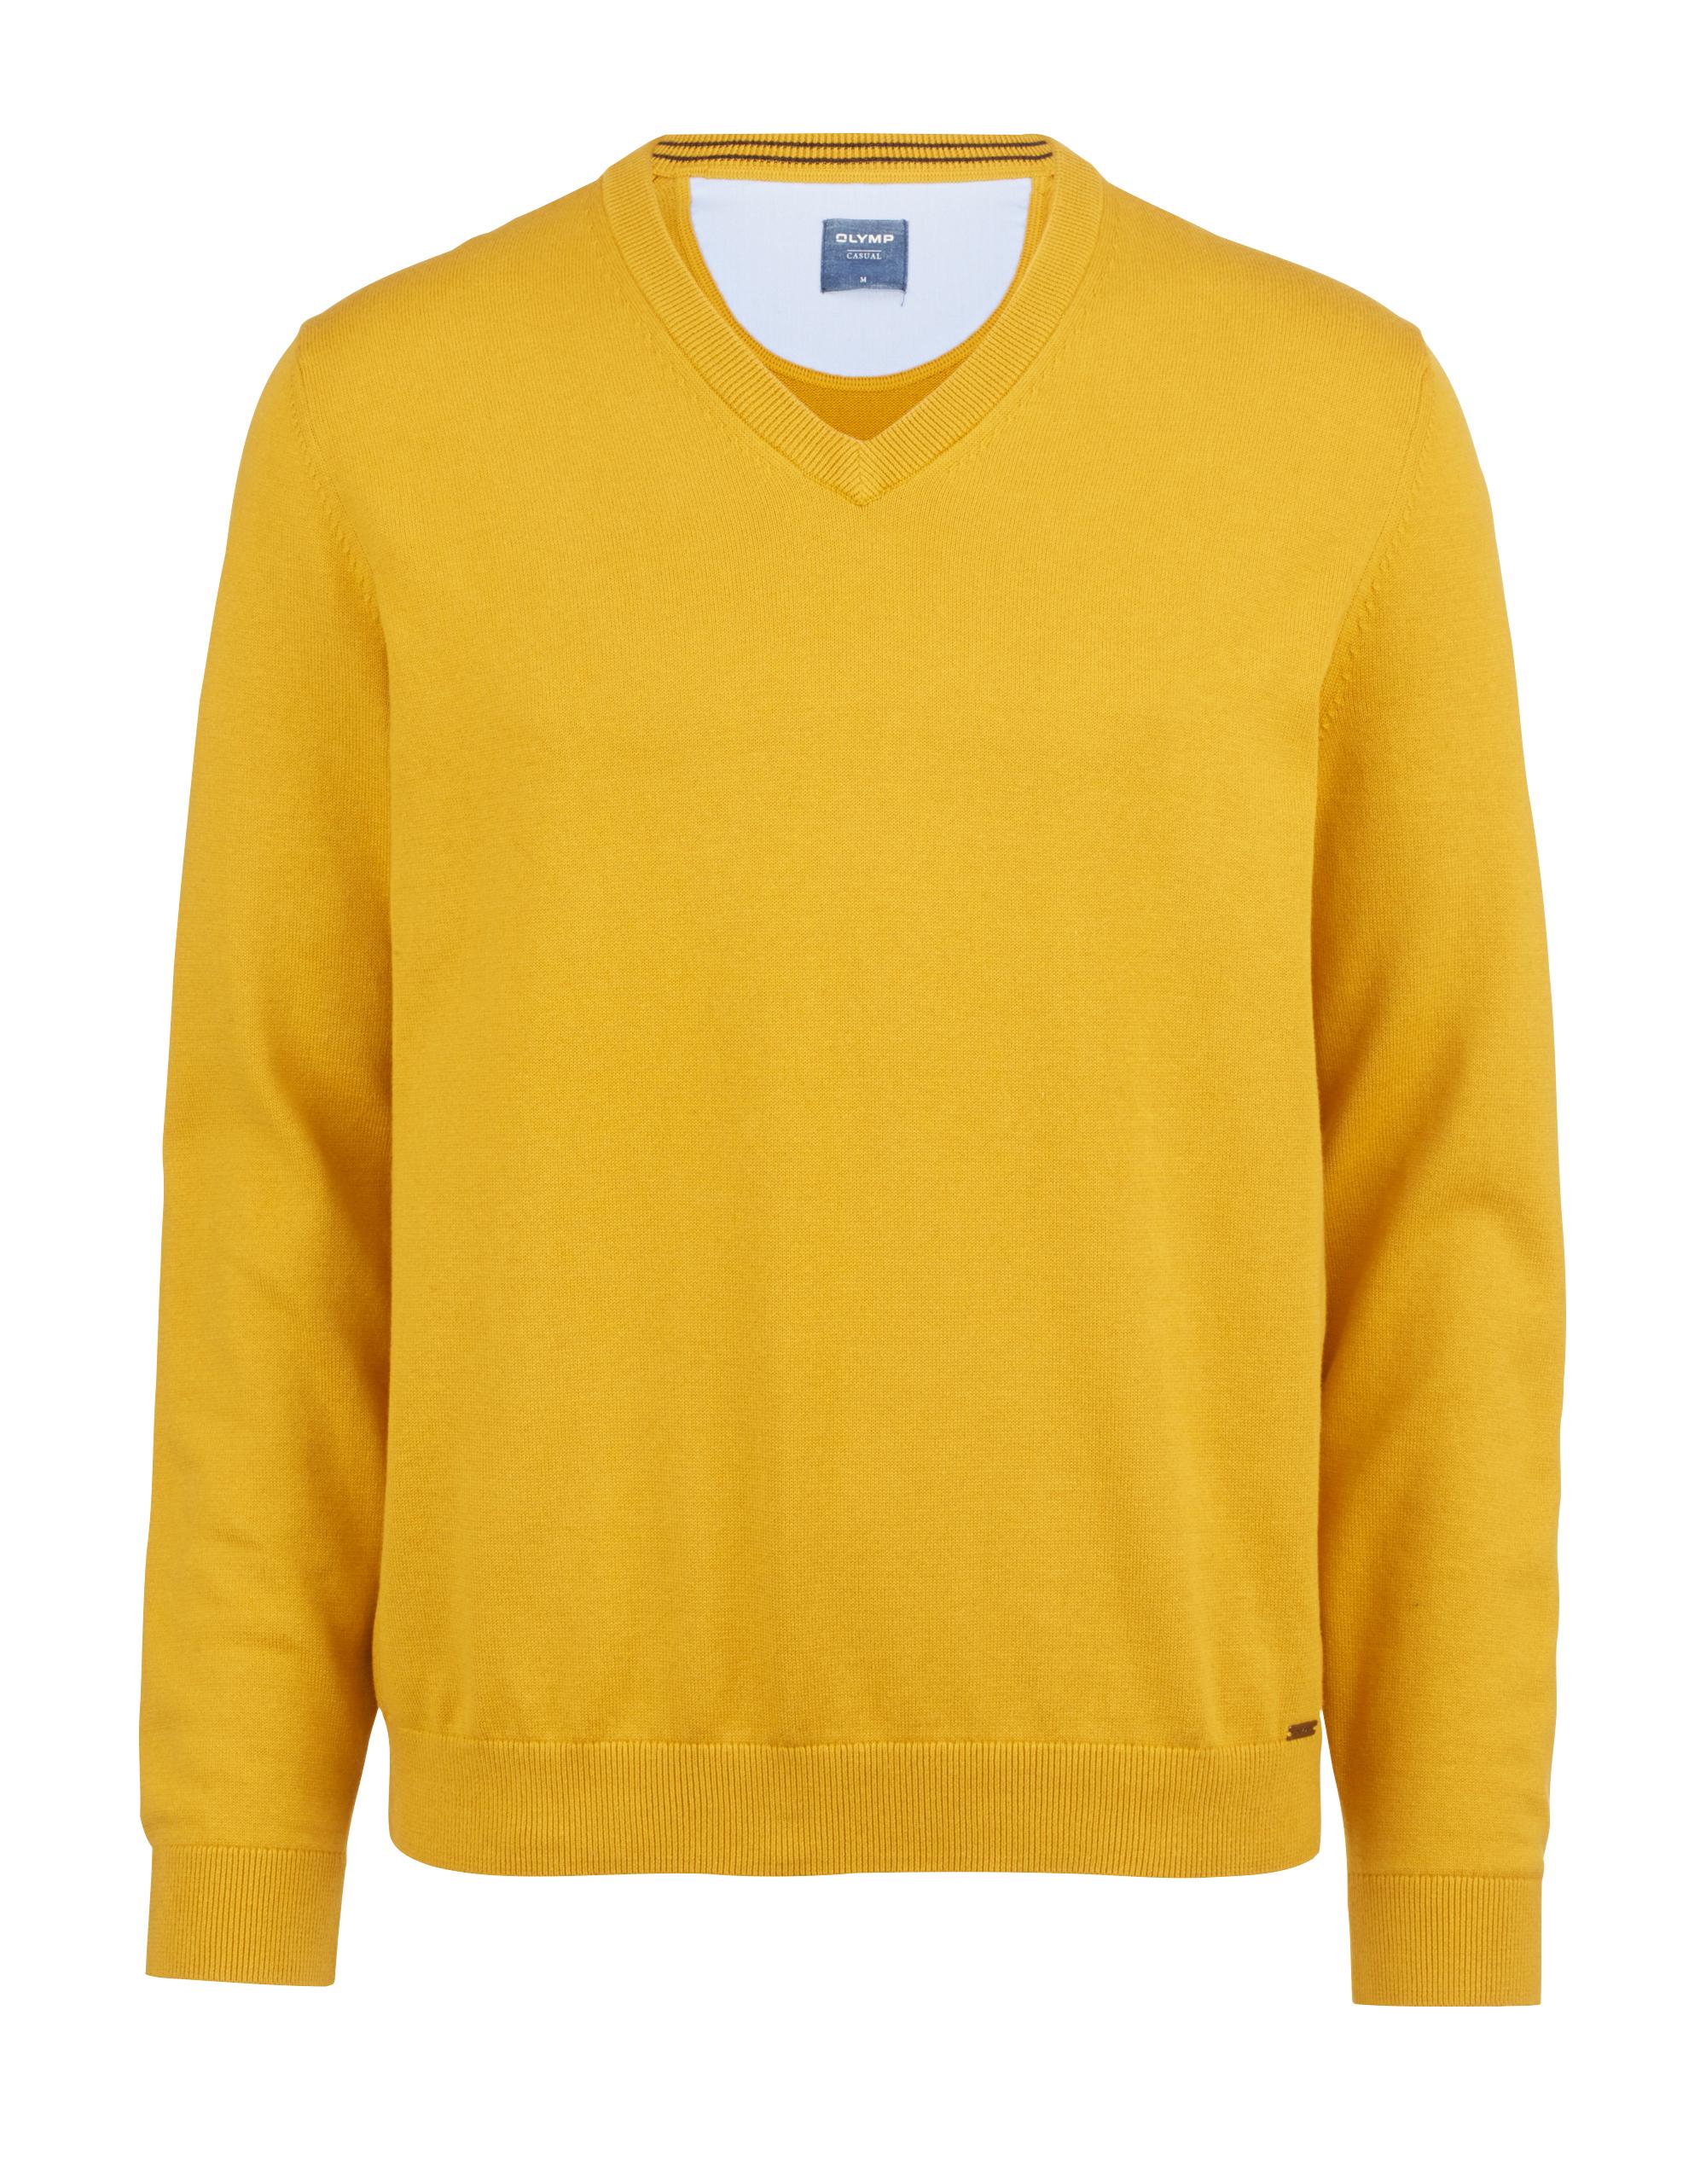 OLYMP Strick Pullover, modern fit, Ocker, 3XL | Bekleidung > Pullover > Sonstige Pullover | Ocker | Baumwolle | OLYMP Strick